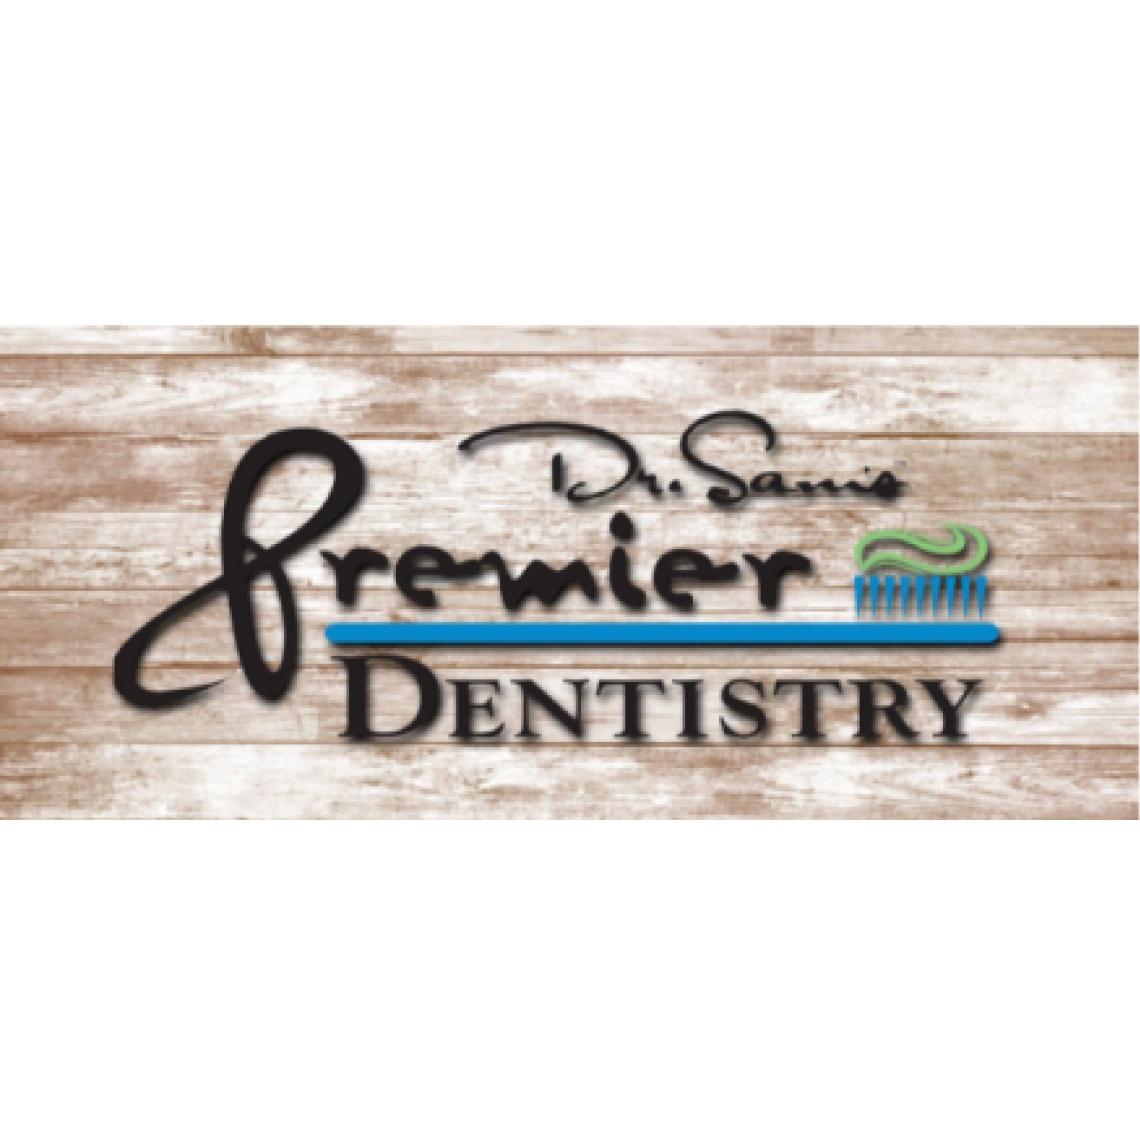 Dr. Sam's Premier Dentistry